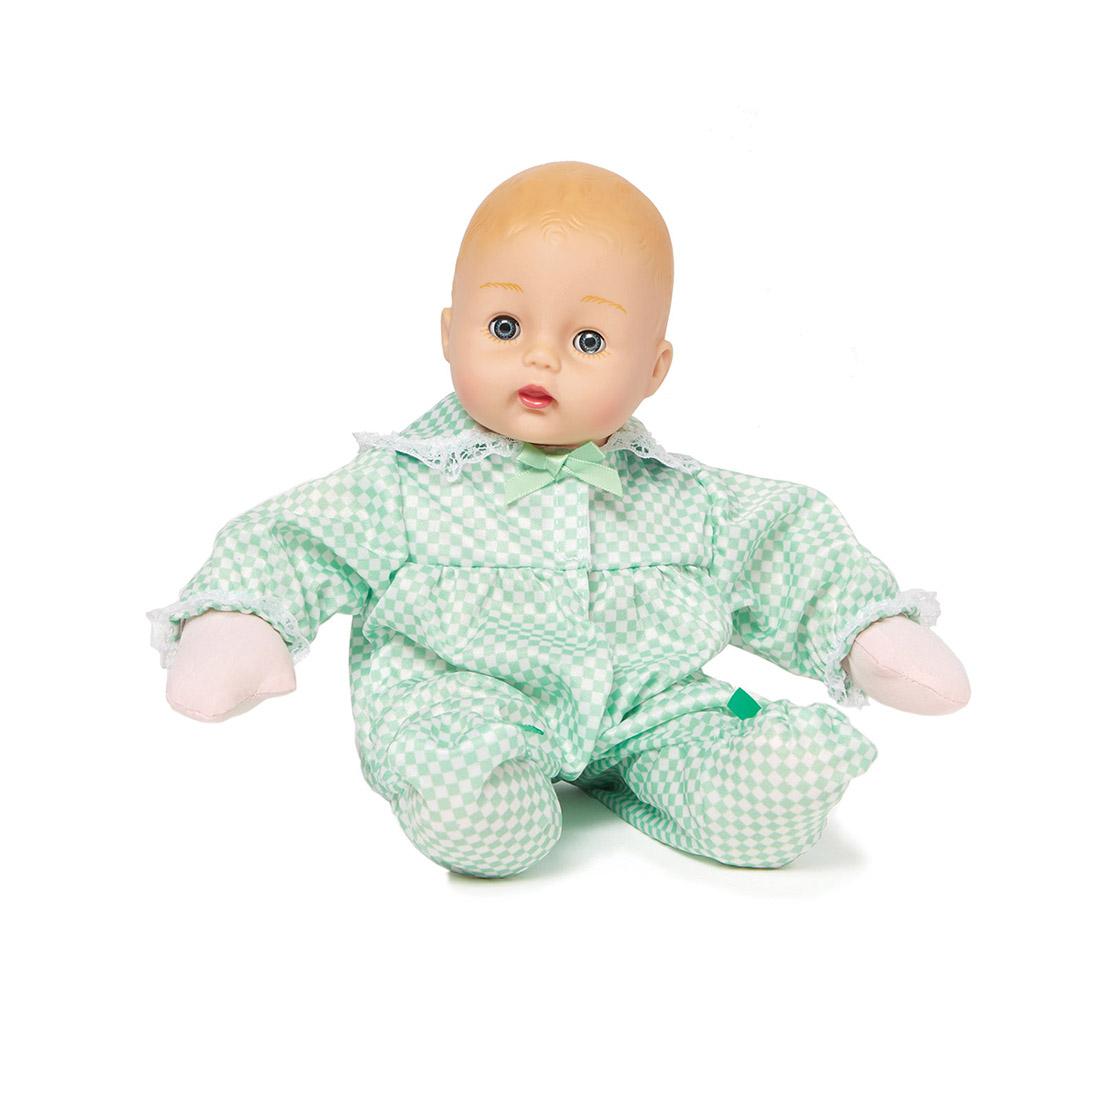 Mint Check Huggums doll